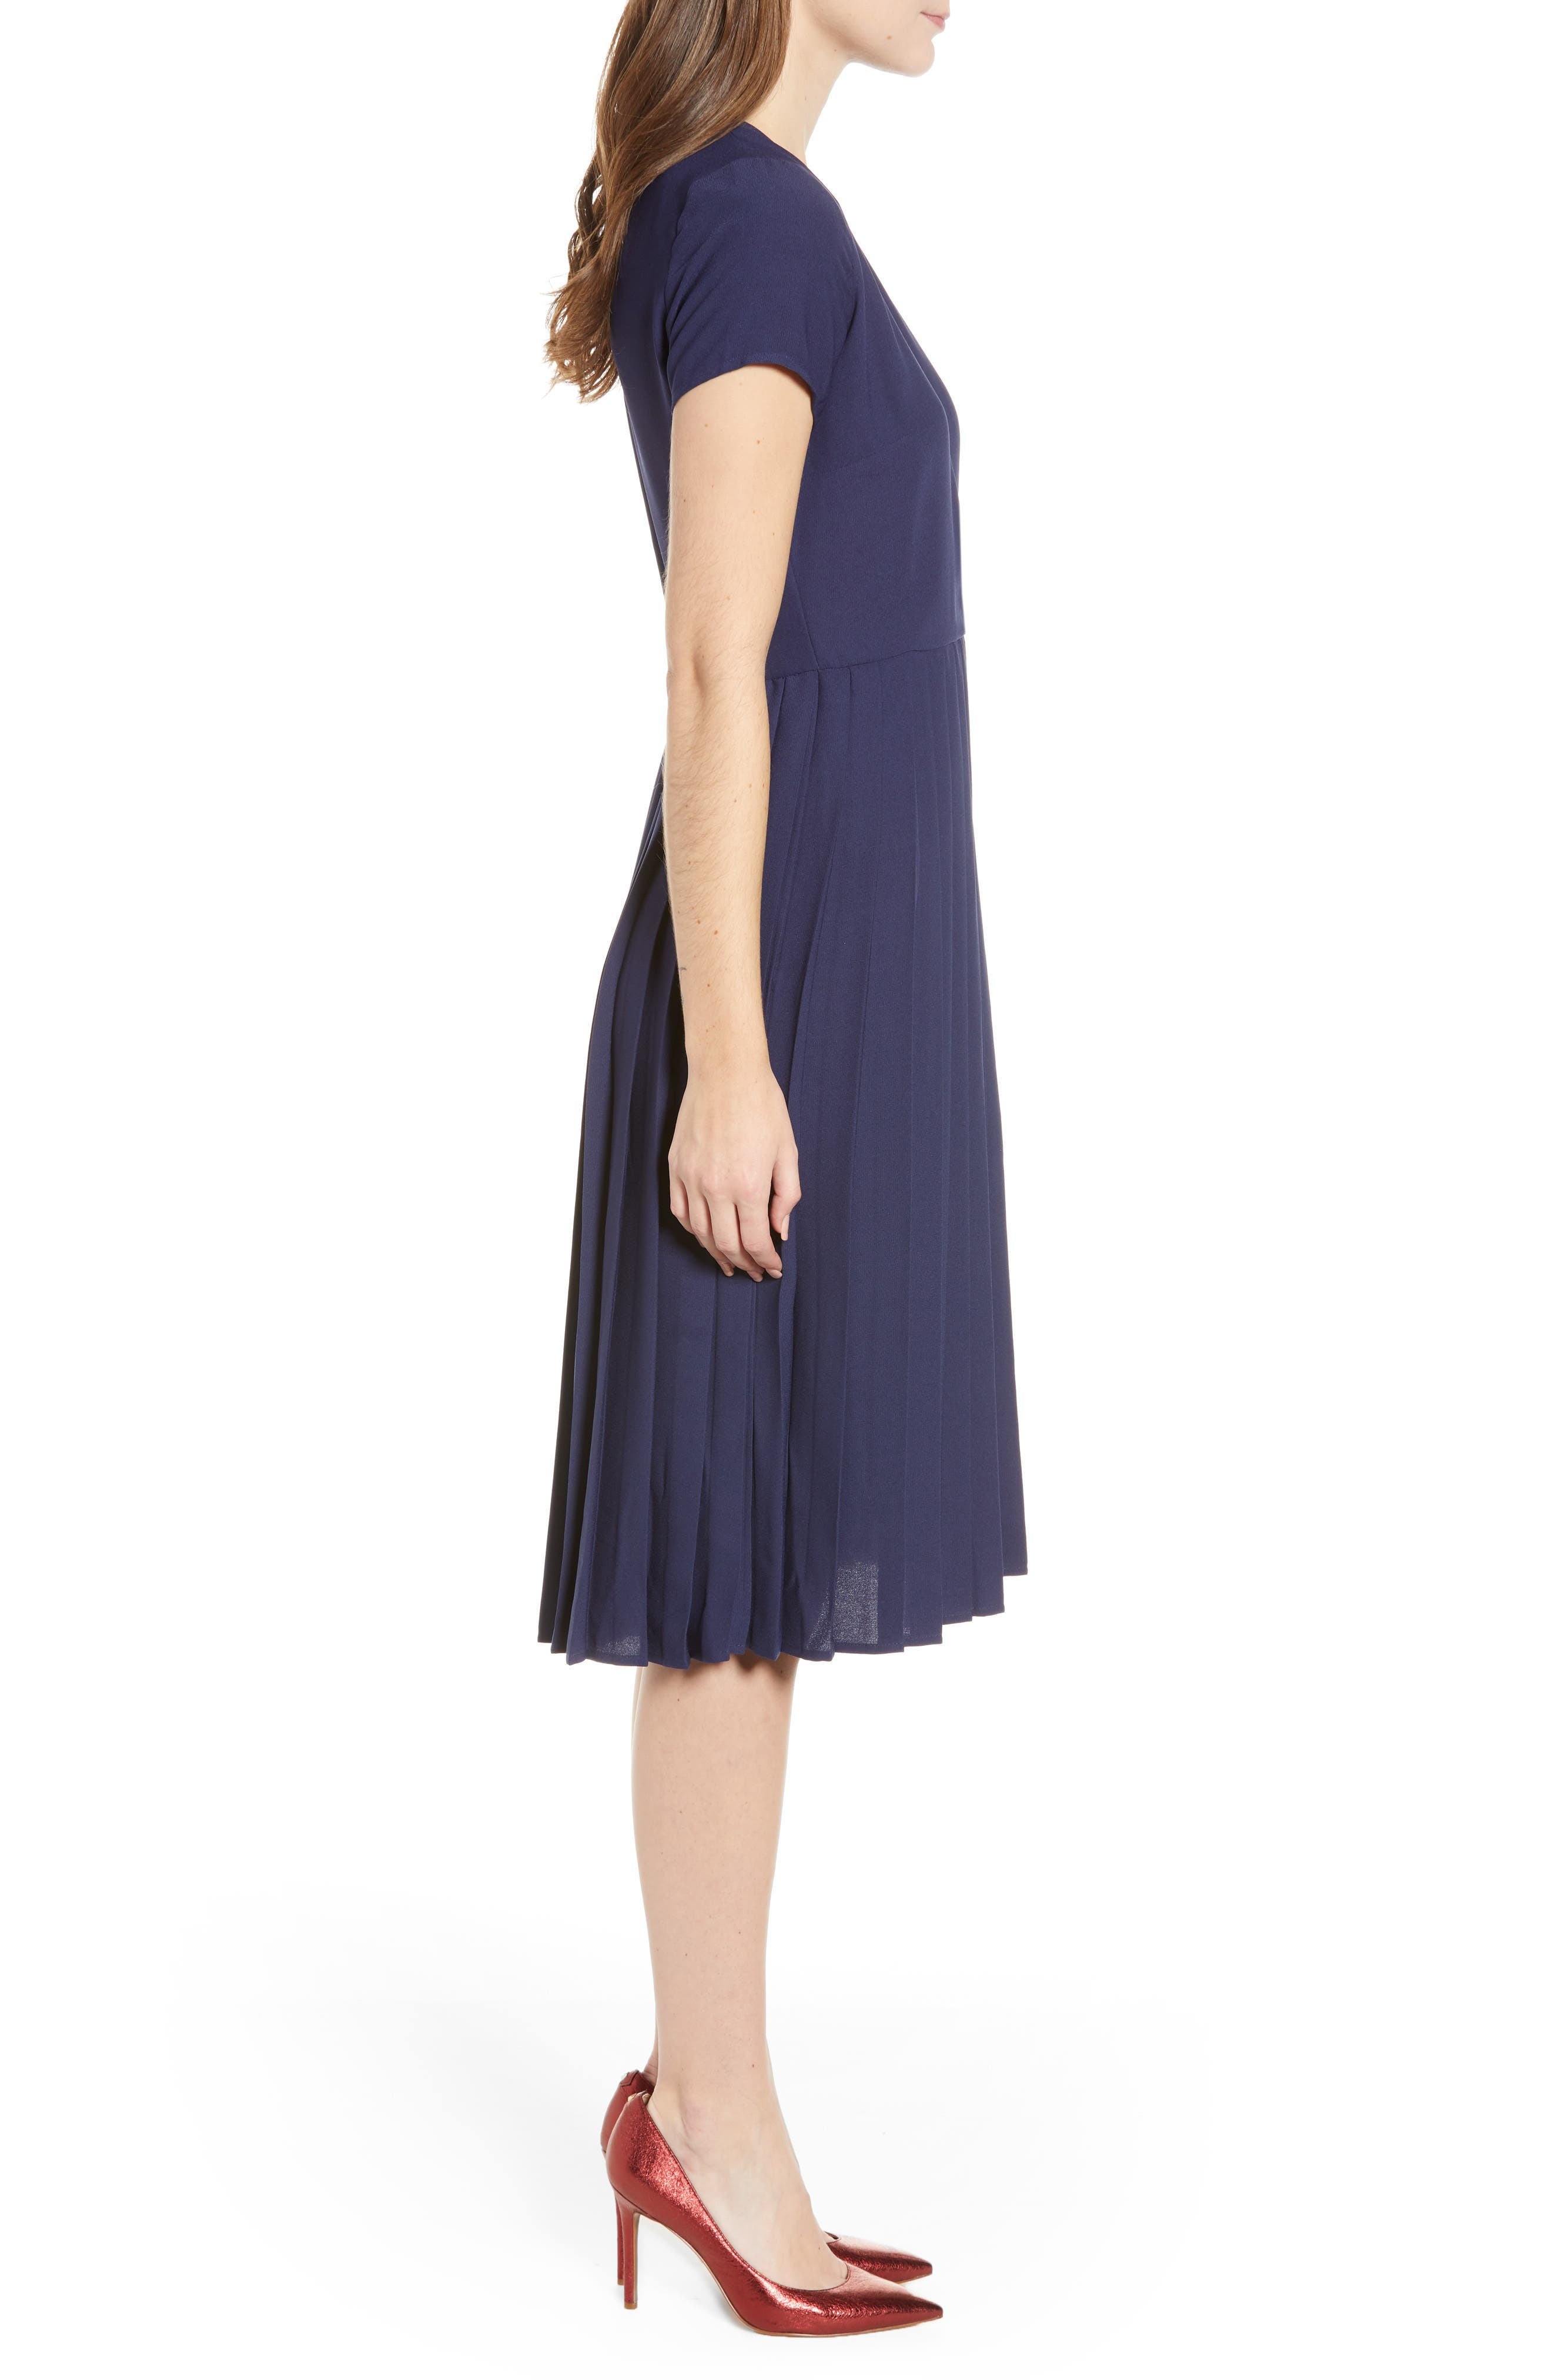 LEITH, Pleated Surplice Dress, Alternate thumbnail 5, color, NAVY PEACOAT